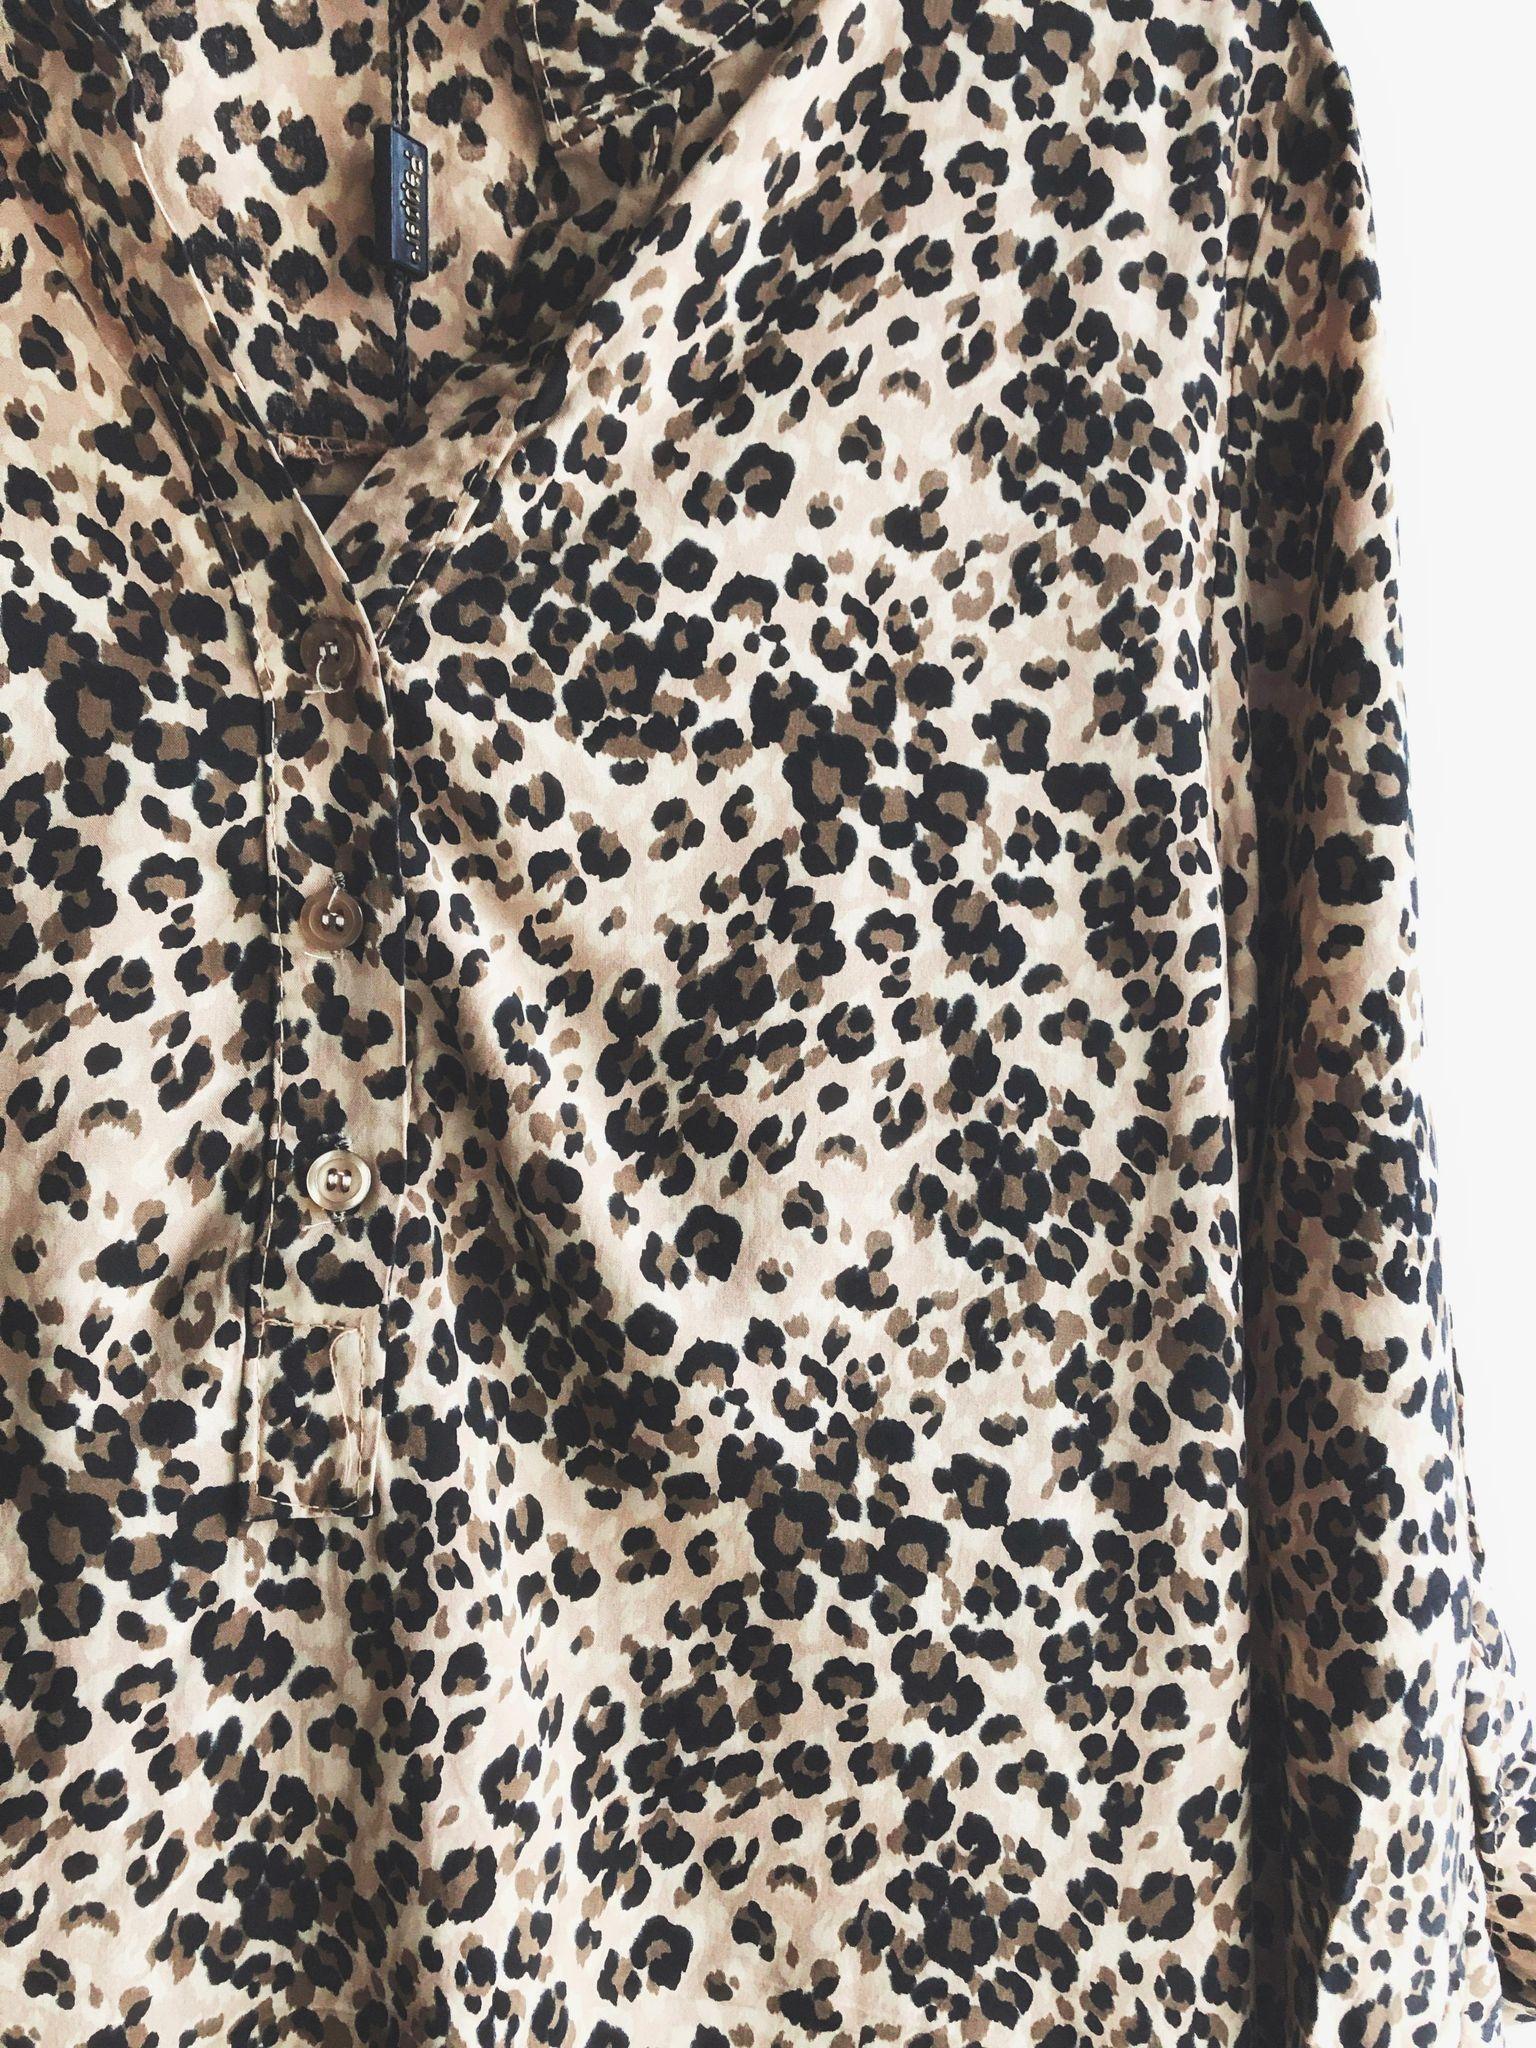 Leopard Bluse Dorothea.no